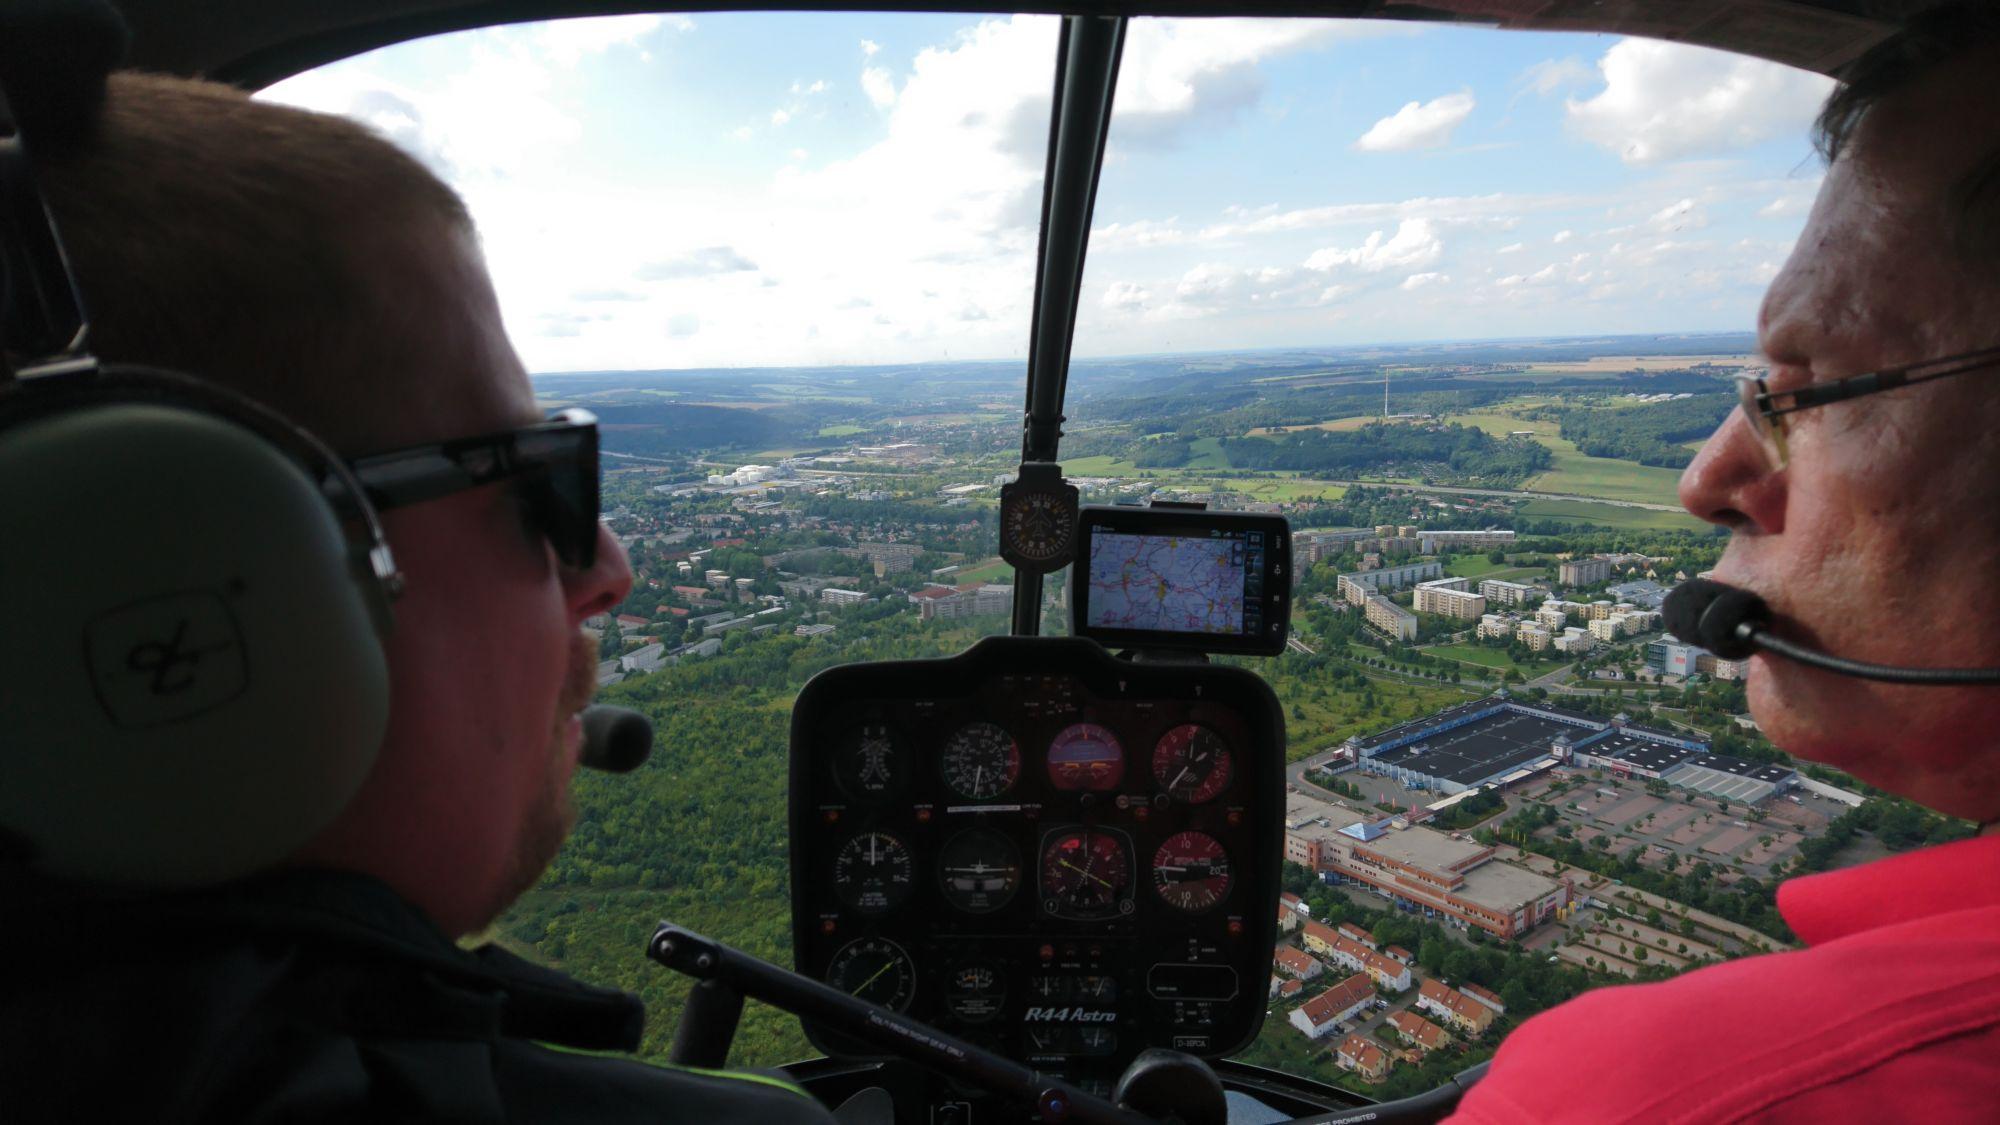 Hubschrauberflug: Blick aus dem Cockpit